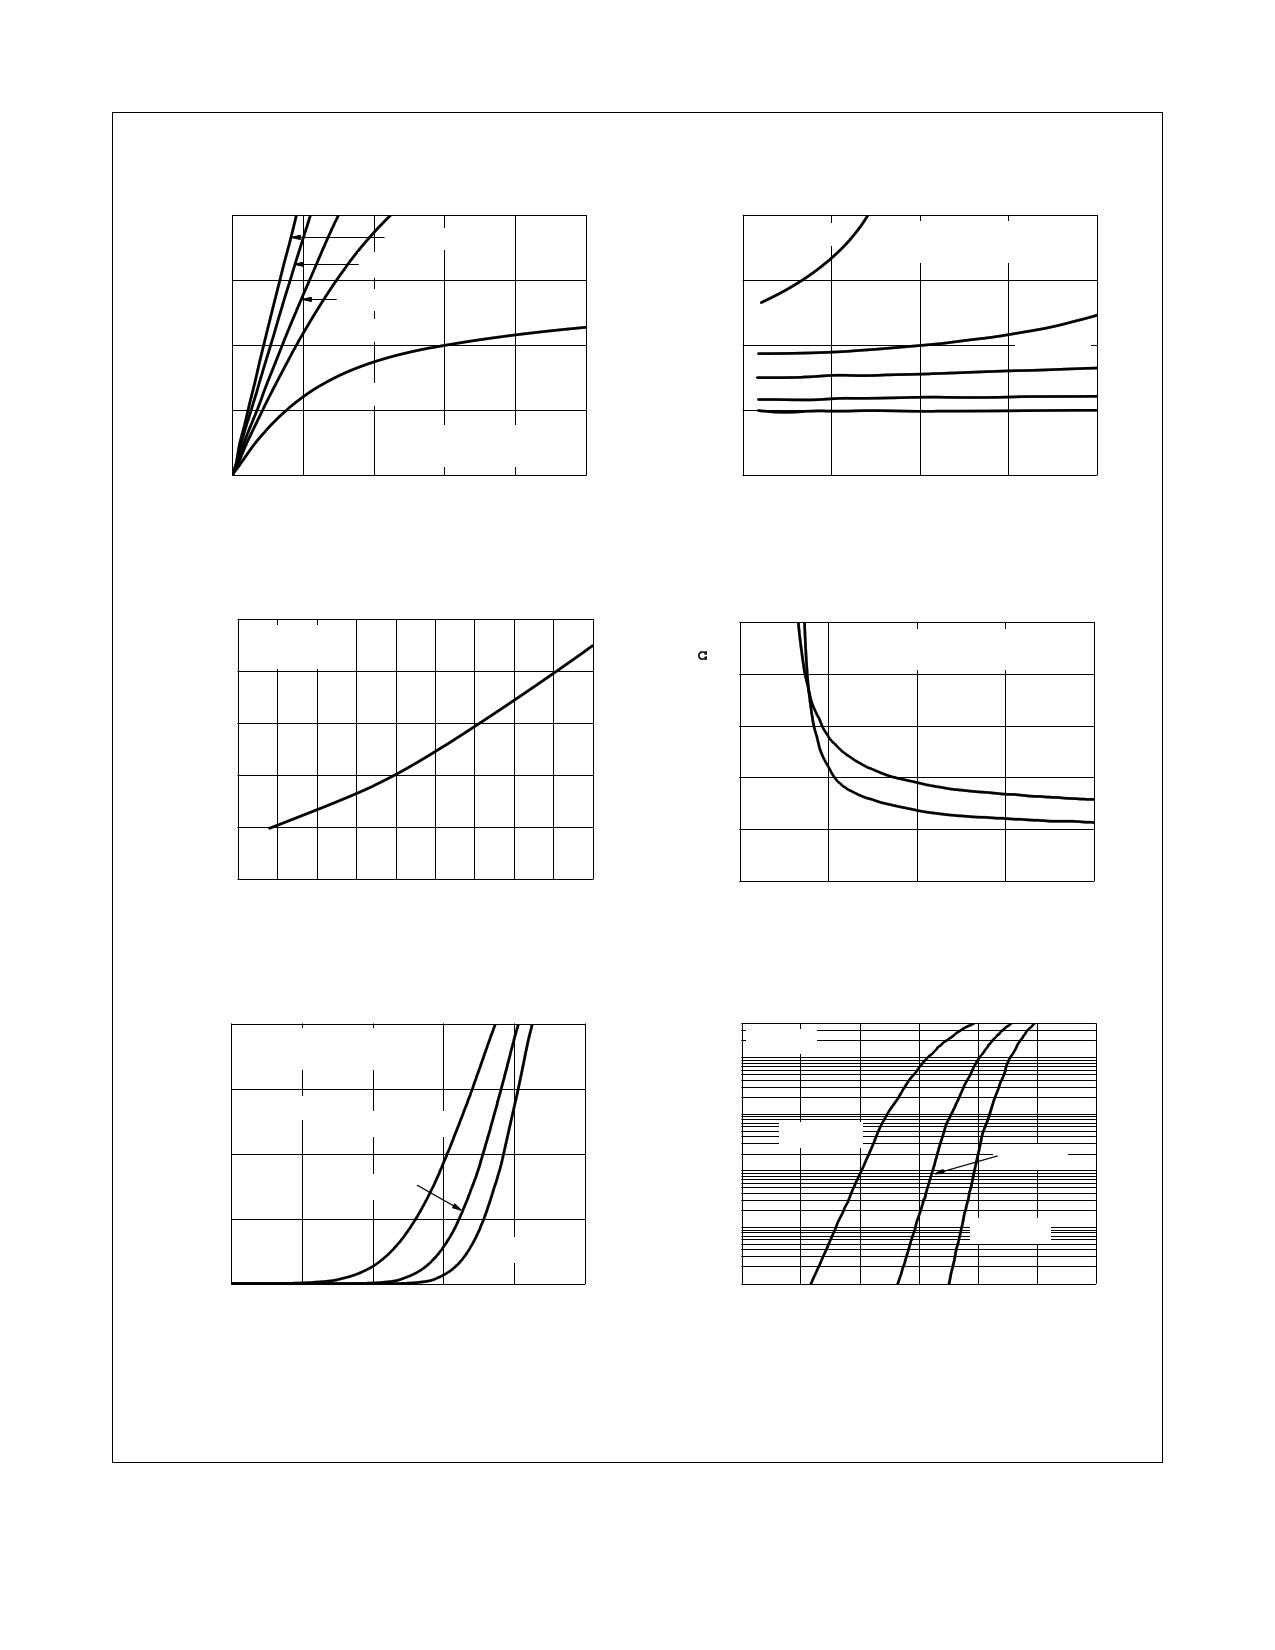 FDMS3686S pdf, 반도체, 판매, 대치품